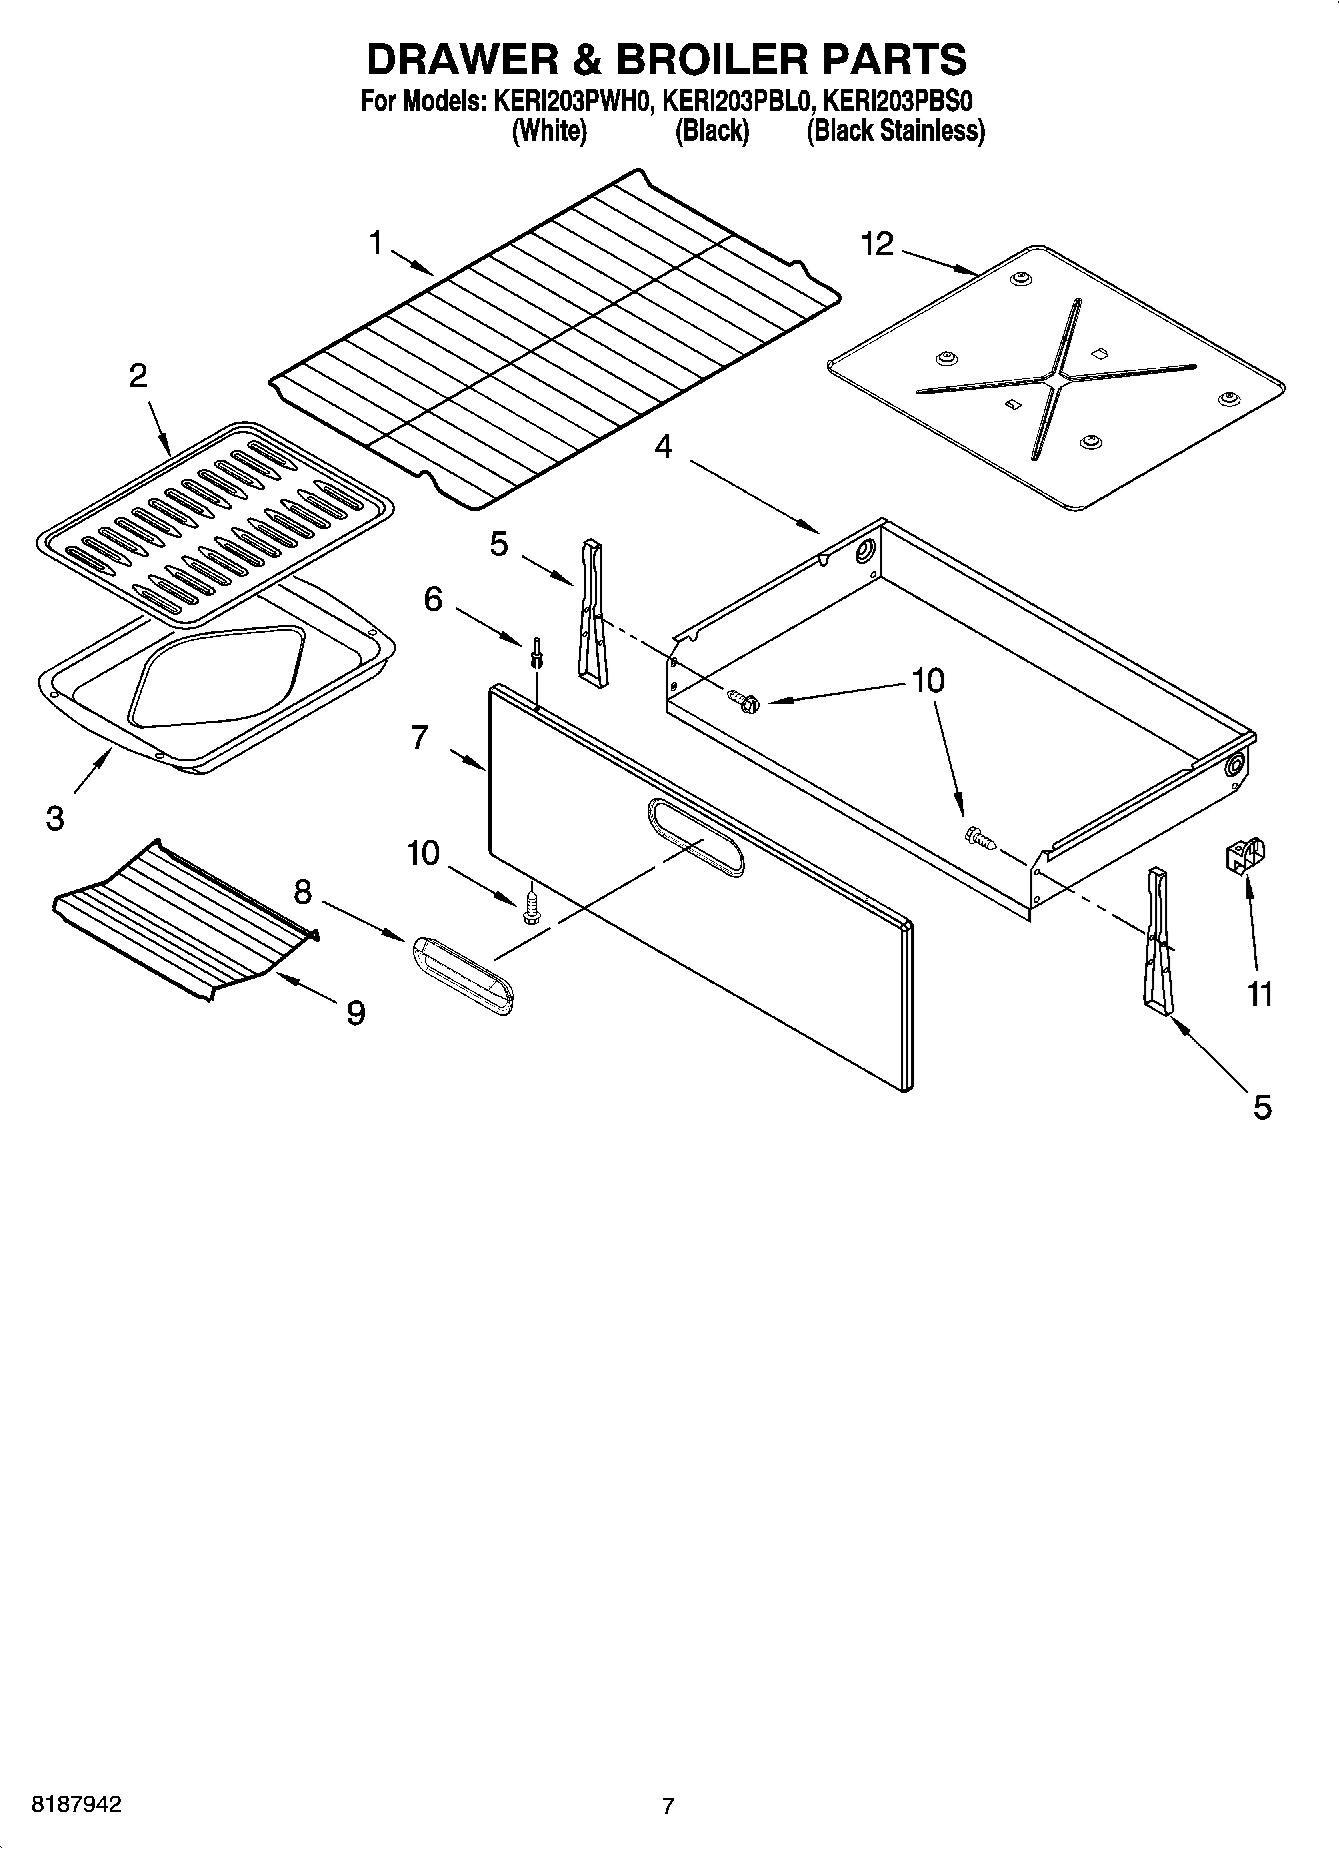 WhirlpoolImg_19000101 20150716_00108538?width\\\=1000 5krc49tn2235x wiring diagram 5krc49tn2235x wiring diagrams  at cos-gaming.co